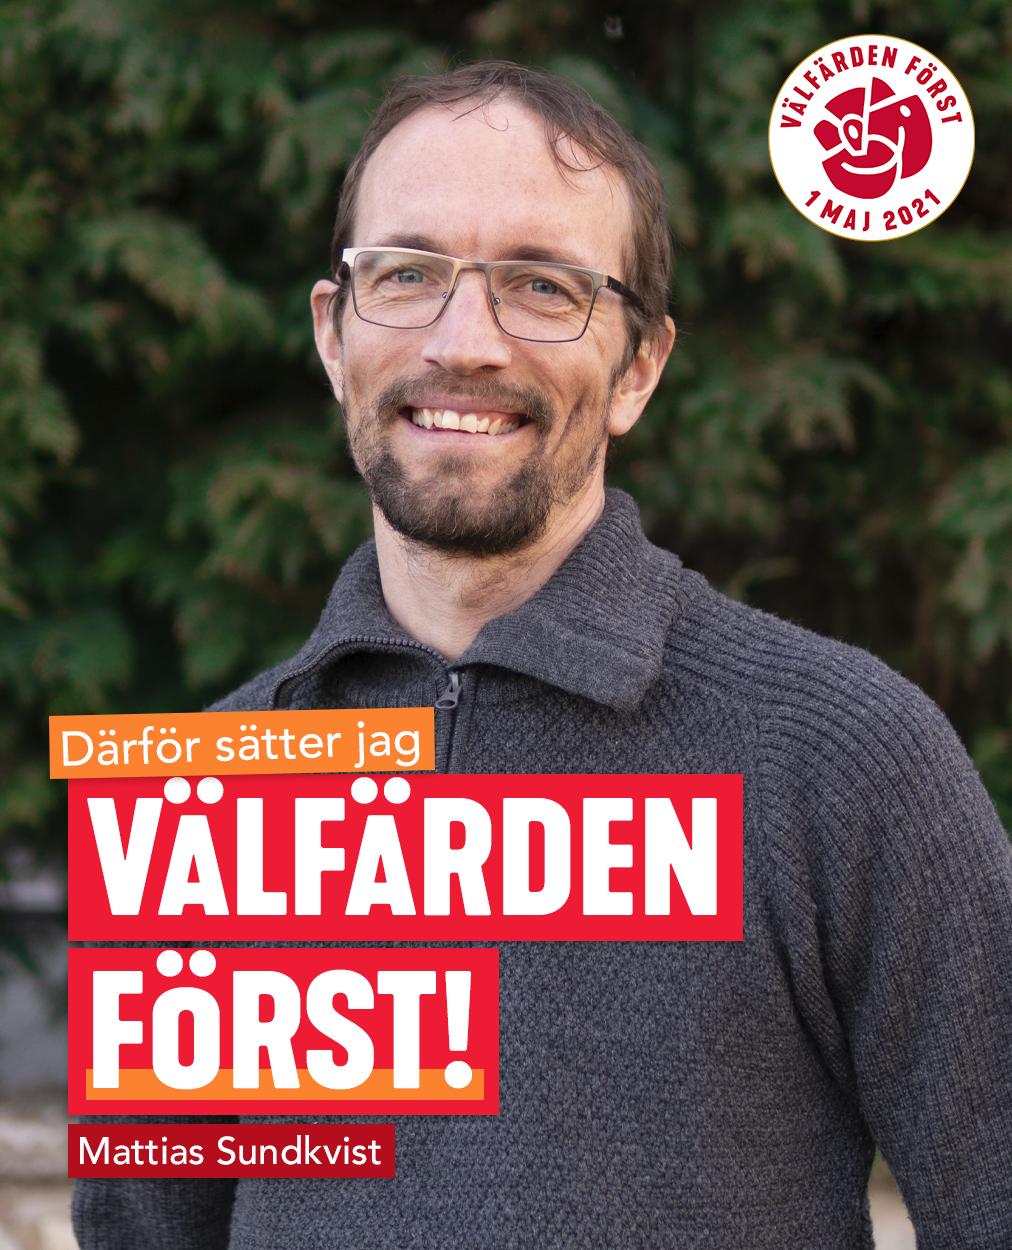 Mattias Sundqvist